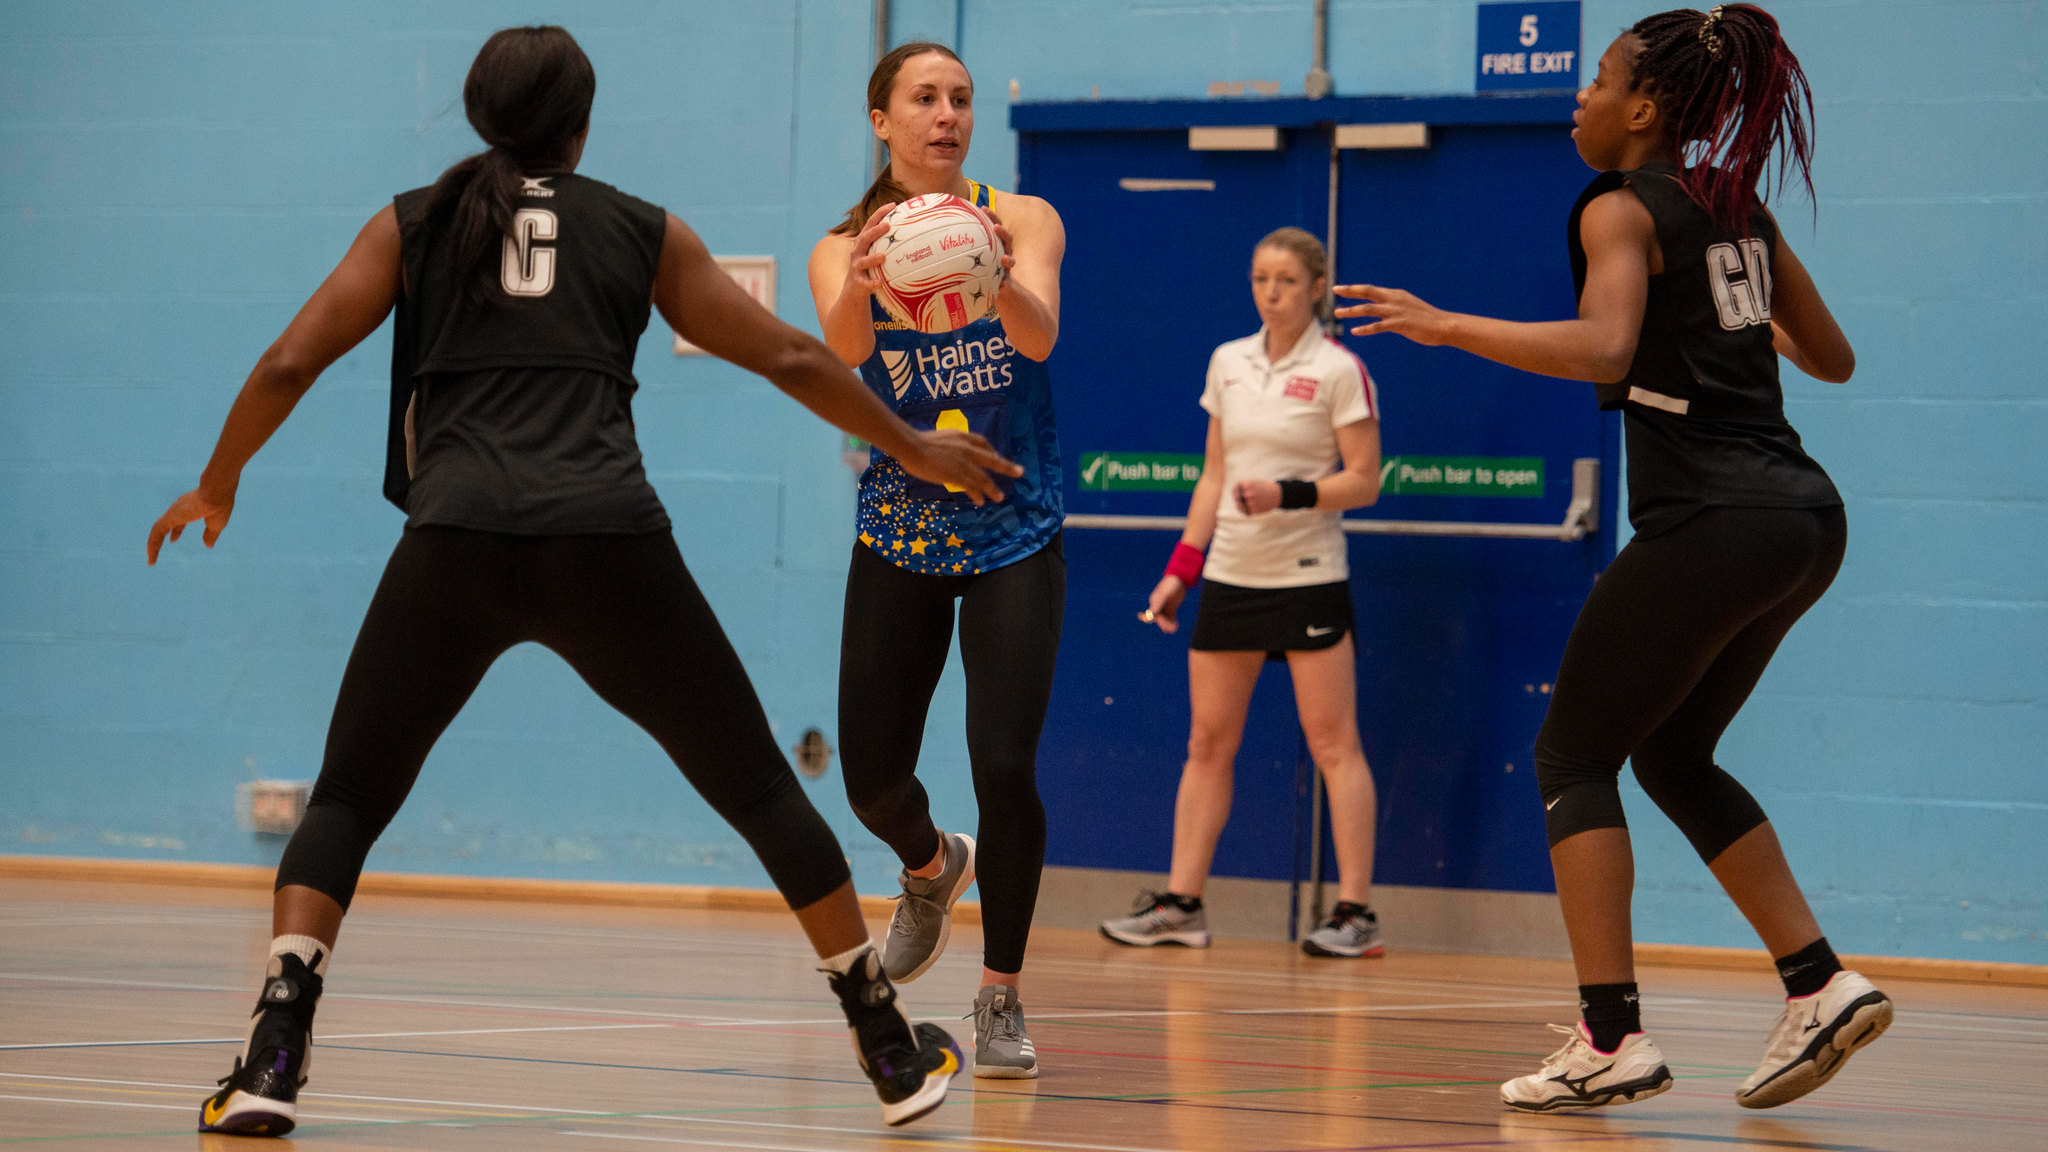 Anya Le Monnier playing for Team Bath Netball